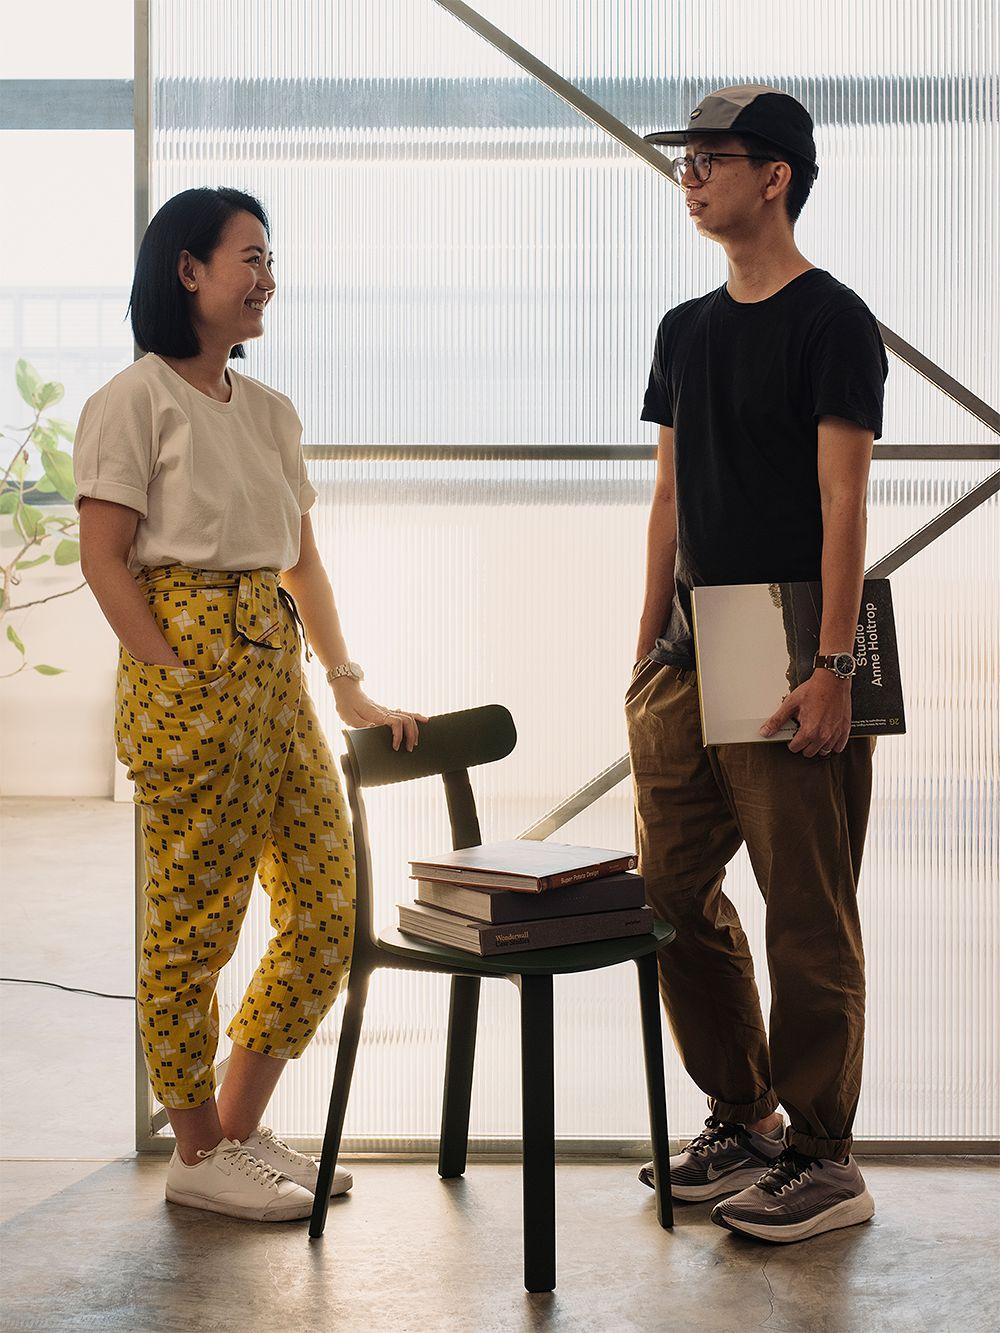 Joy Loo and Khoo Kean Hu with Vitra's All Plastic Chair